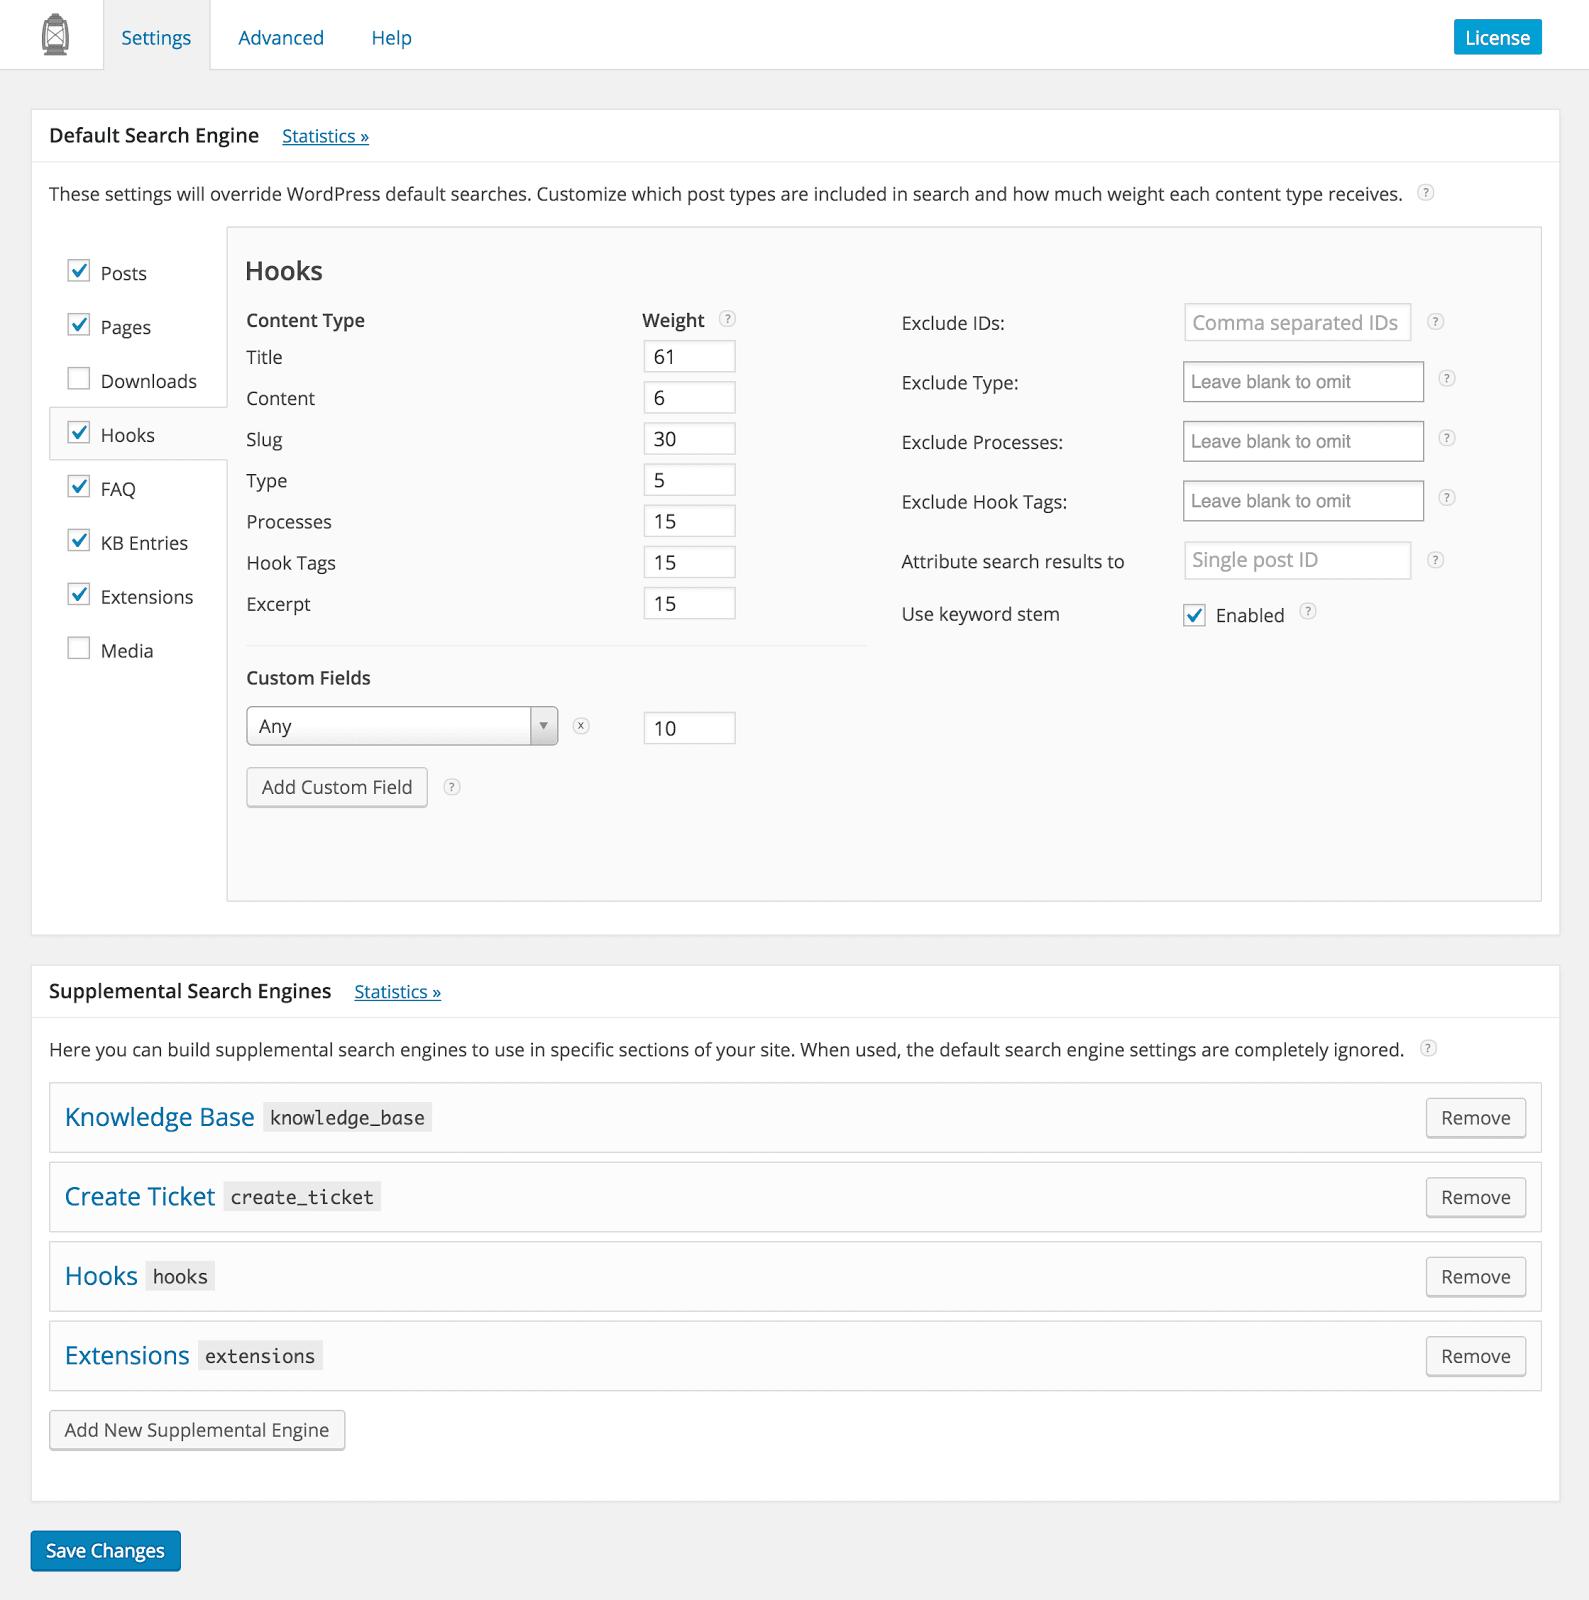 searchwp settings ui.min